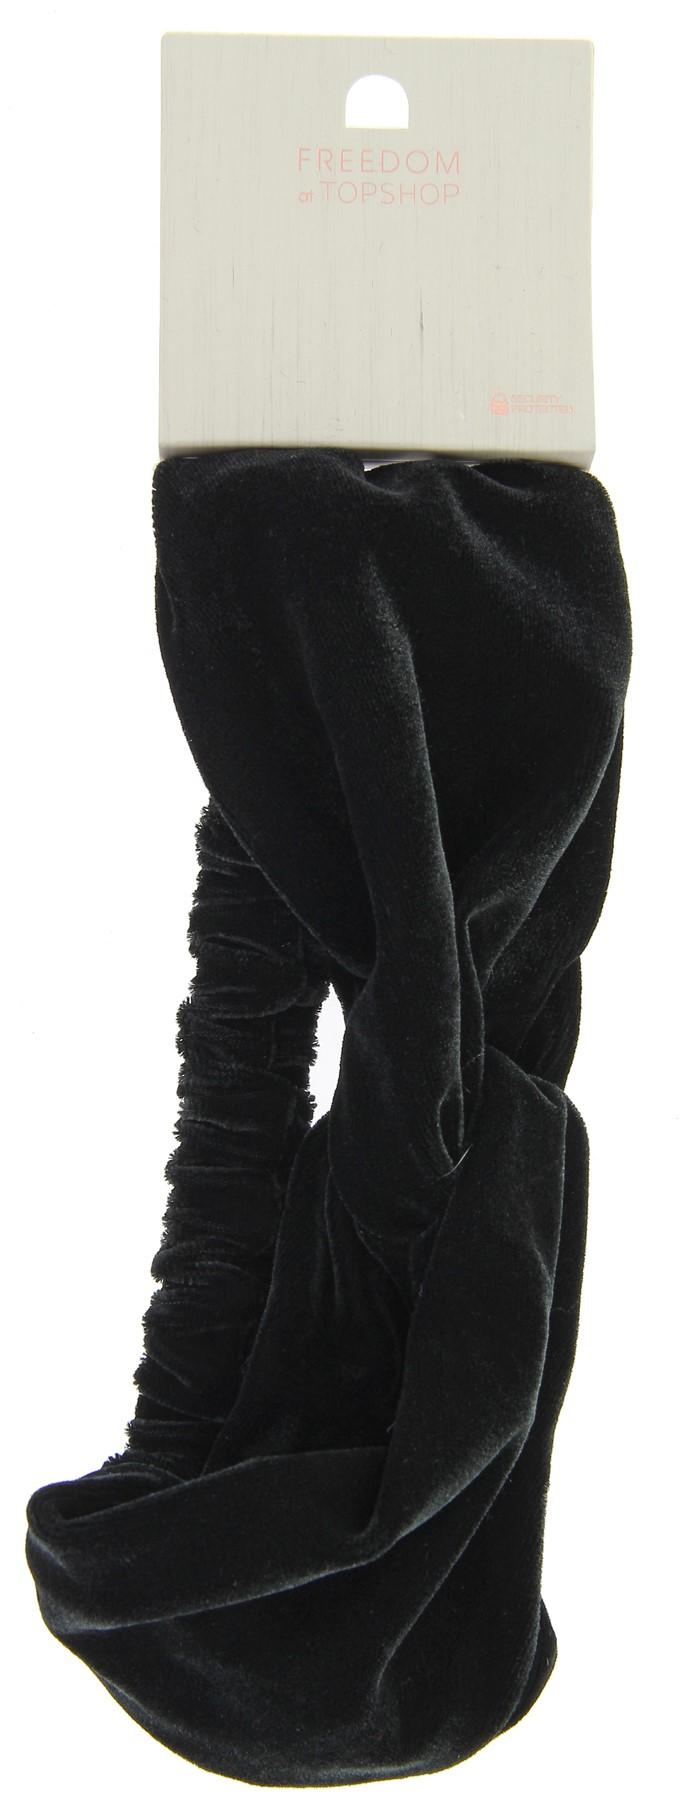 100 x Freedom at TOPSHOP hairbands | UK SELLER | BLACK